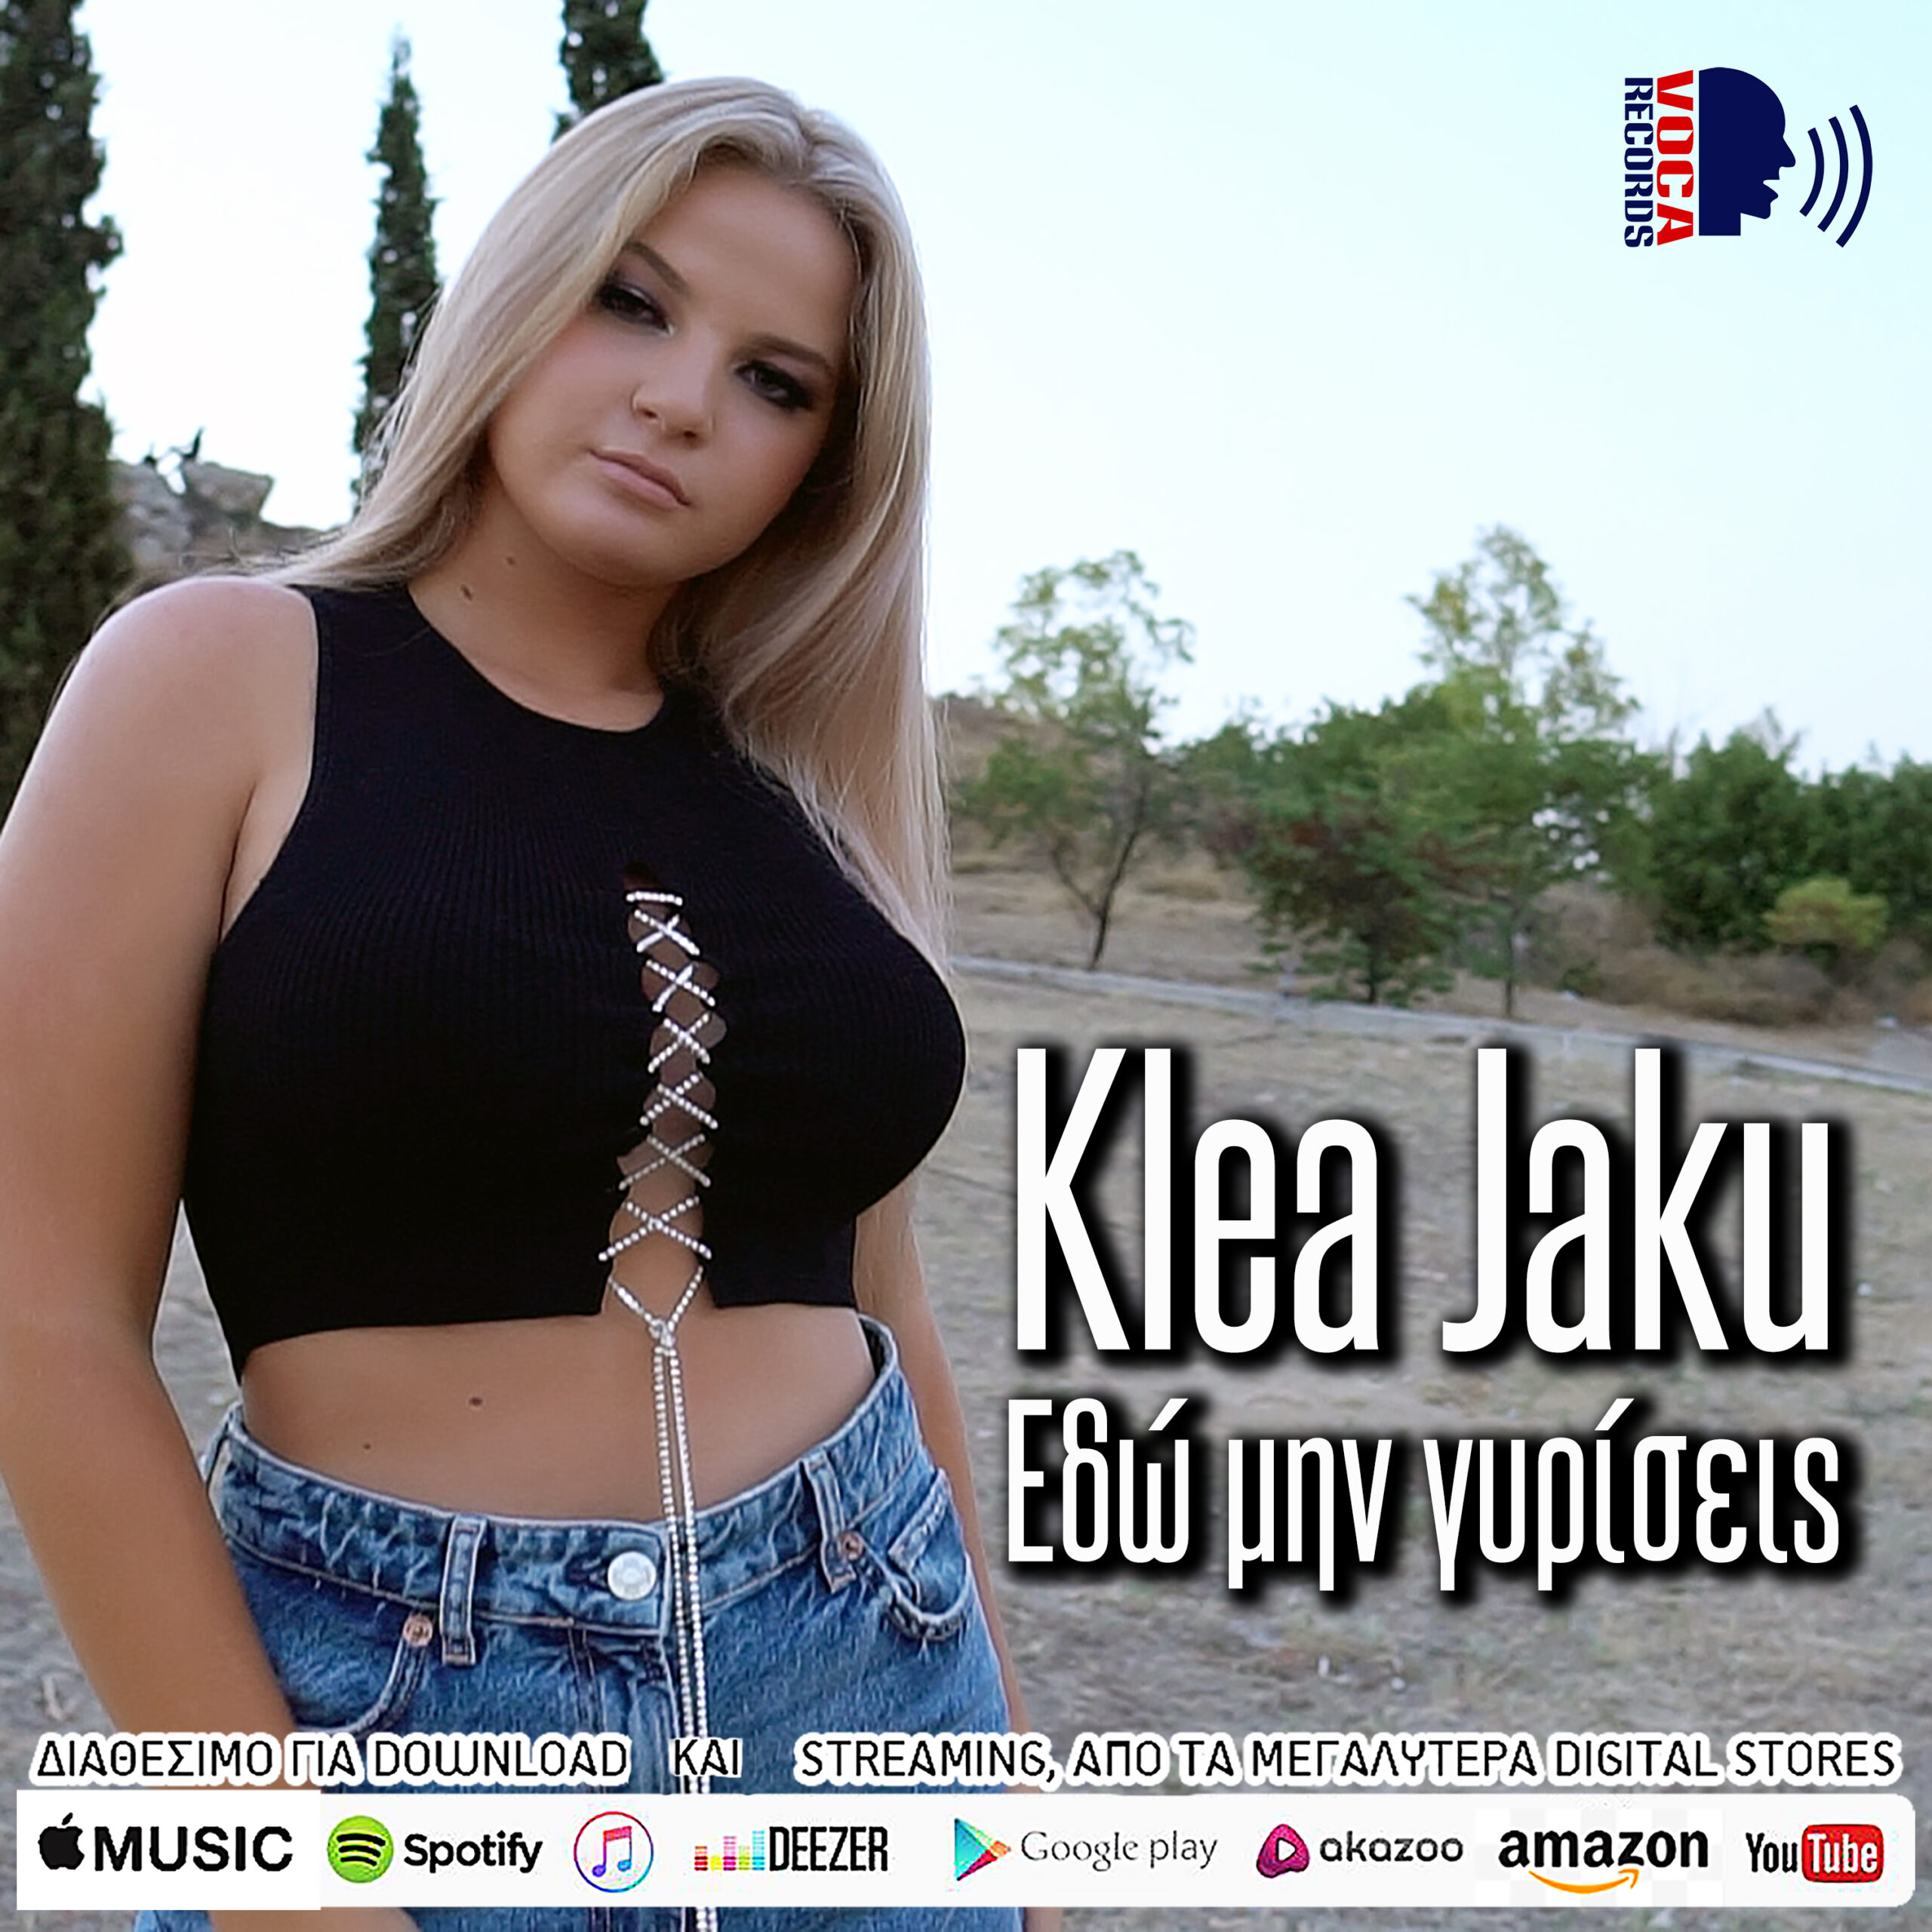 "Klea Jaku ""Εδώ μην γυρίσεις"" δείτε το νέο video clip της 16χρονης τραγουδίστριας !"